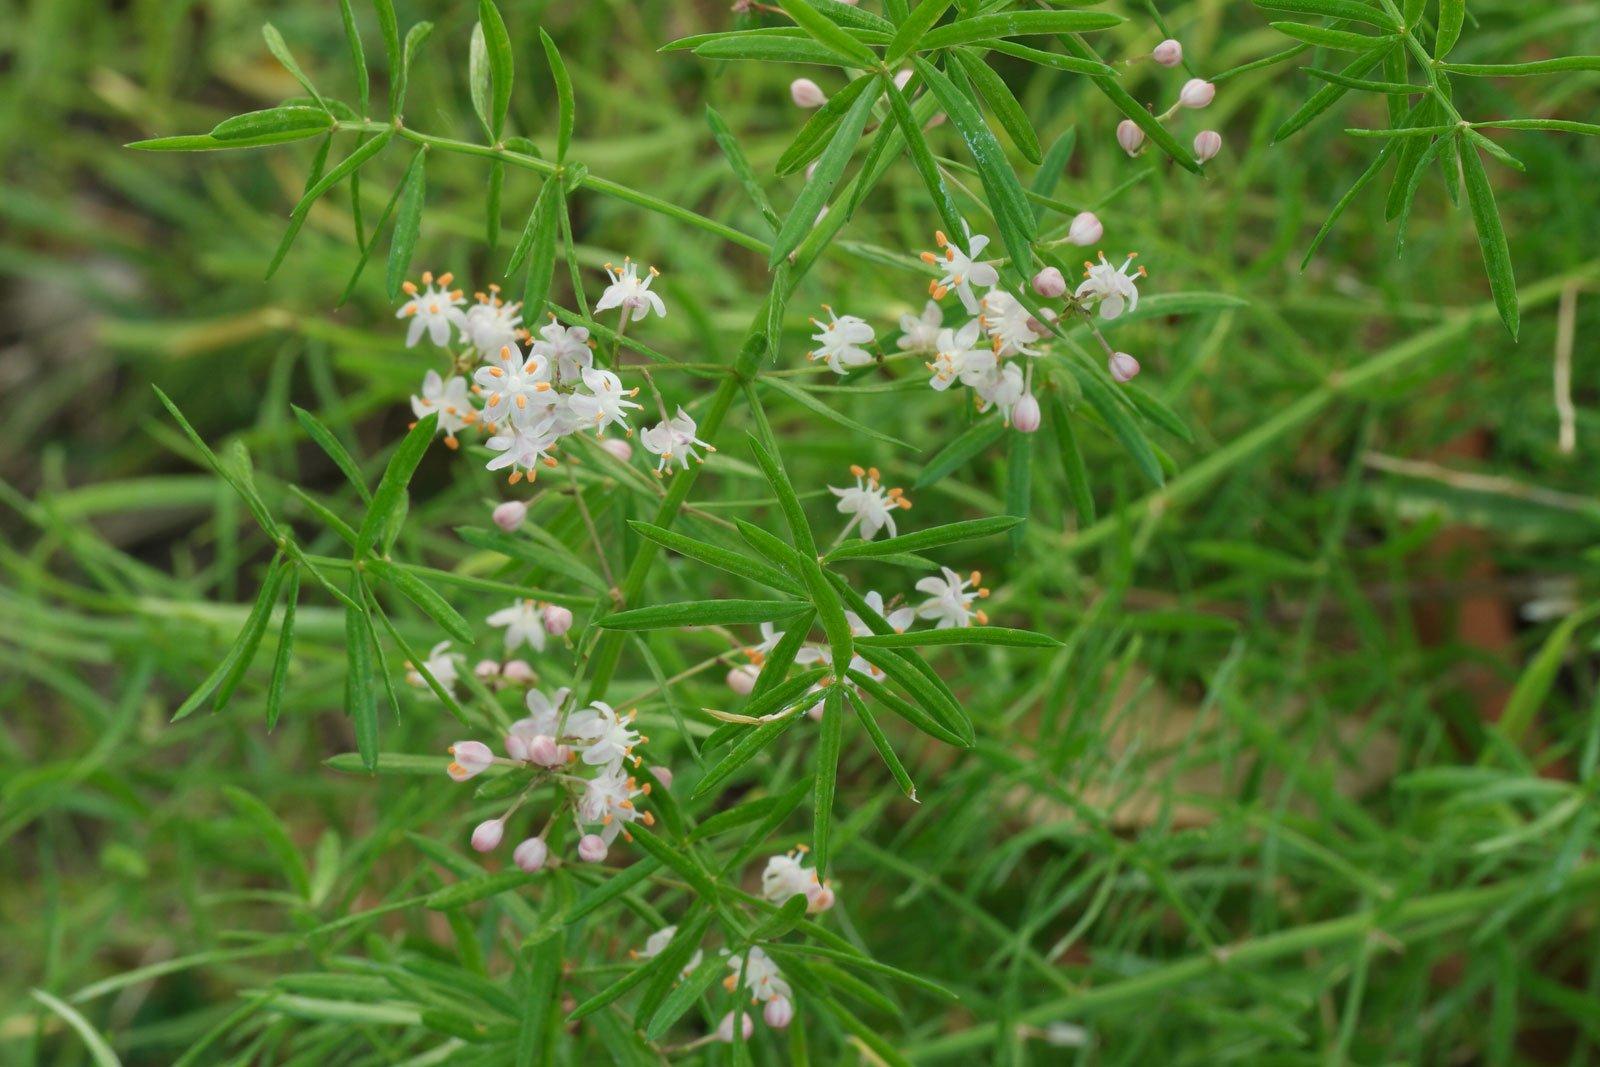 Zierspargel Blüten